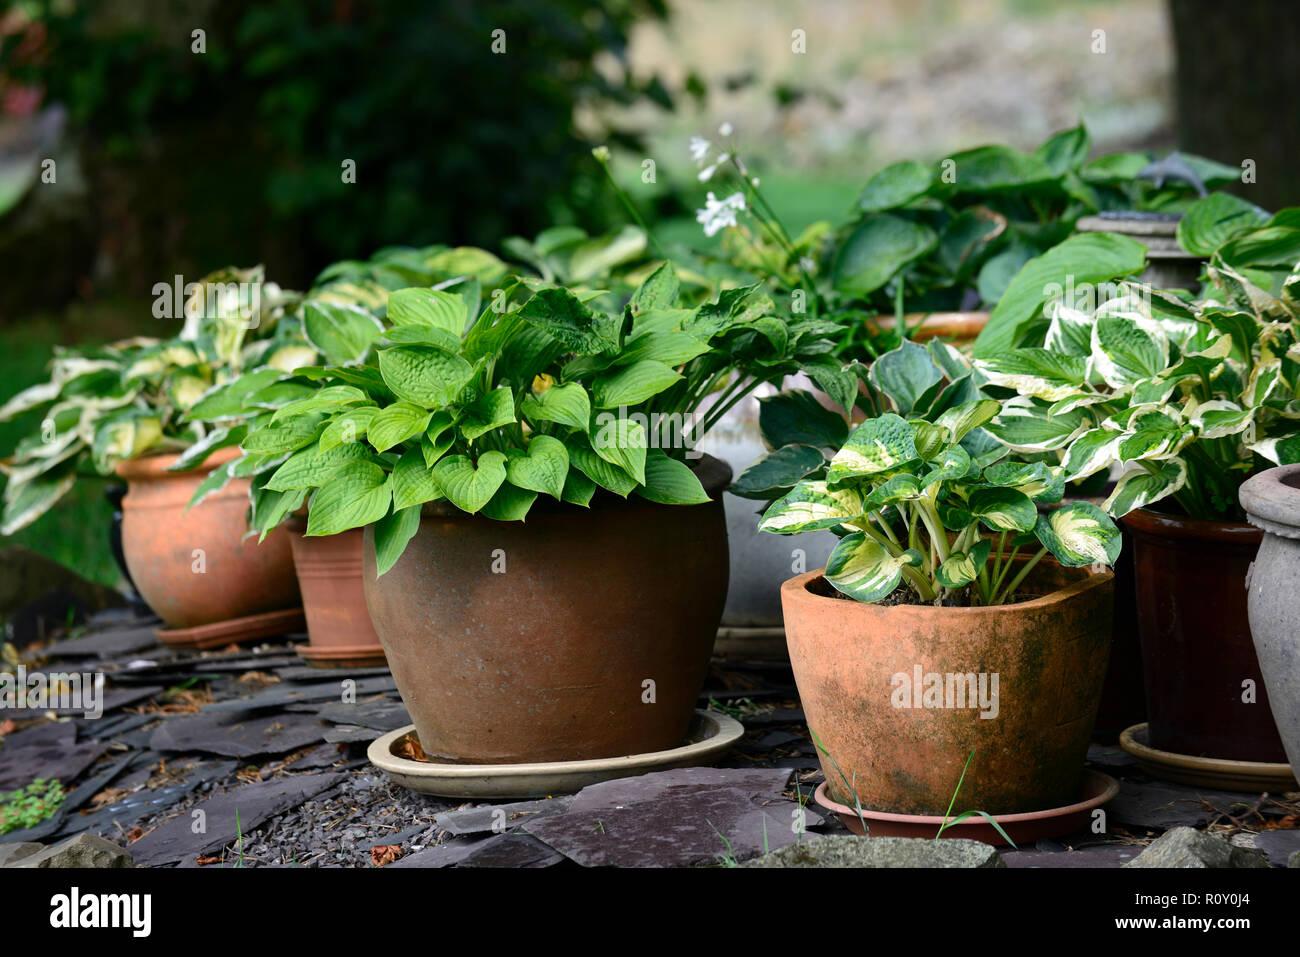 Hosta Pots Stock Photos Hosta Pots Stock Images Alamy